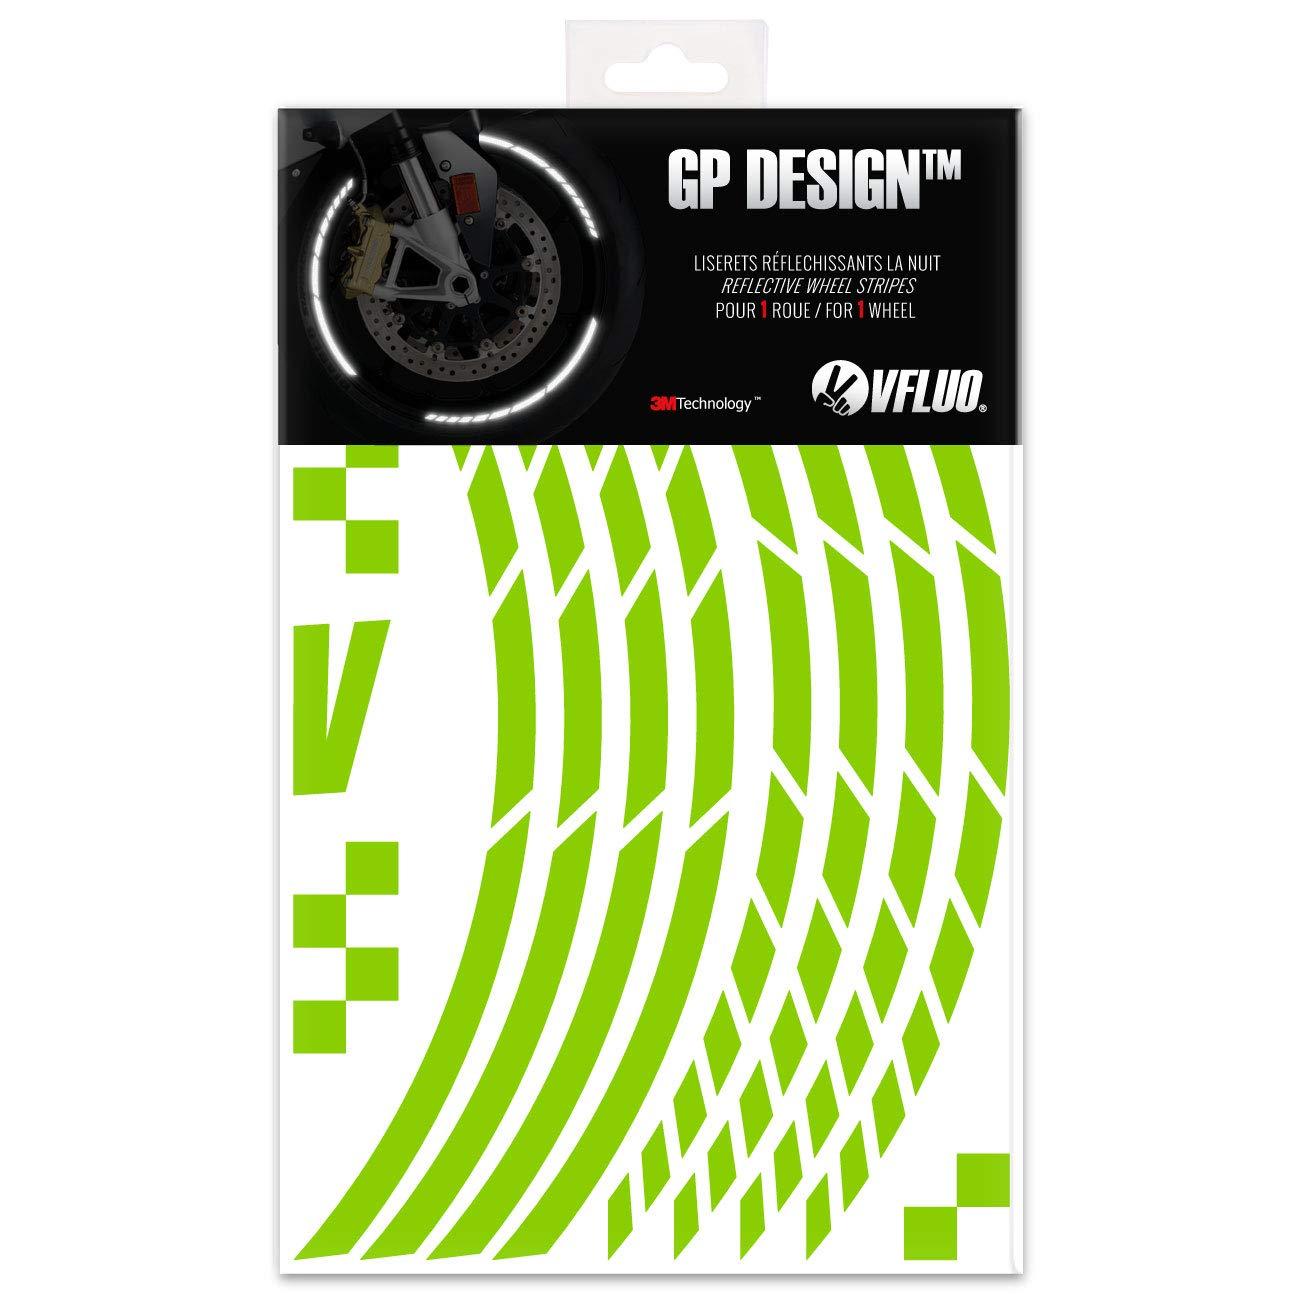 Kit de Cintas VFLUO GP Design/™ Anchura XL : 10 mm 1 Rueda Blanco//Plata 3M Technology/™ Rayas Retro Reflectantes para Llantas de Moto